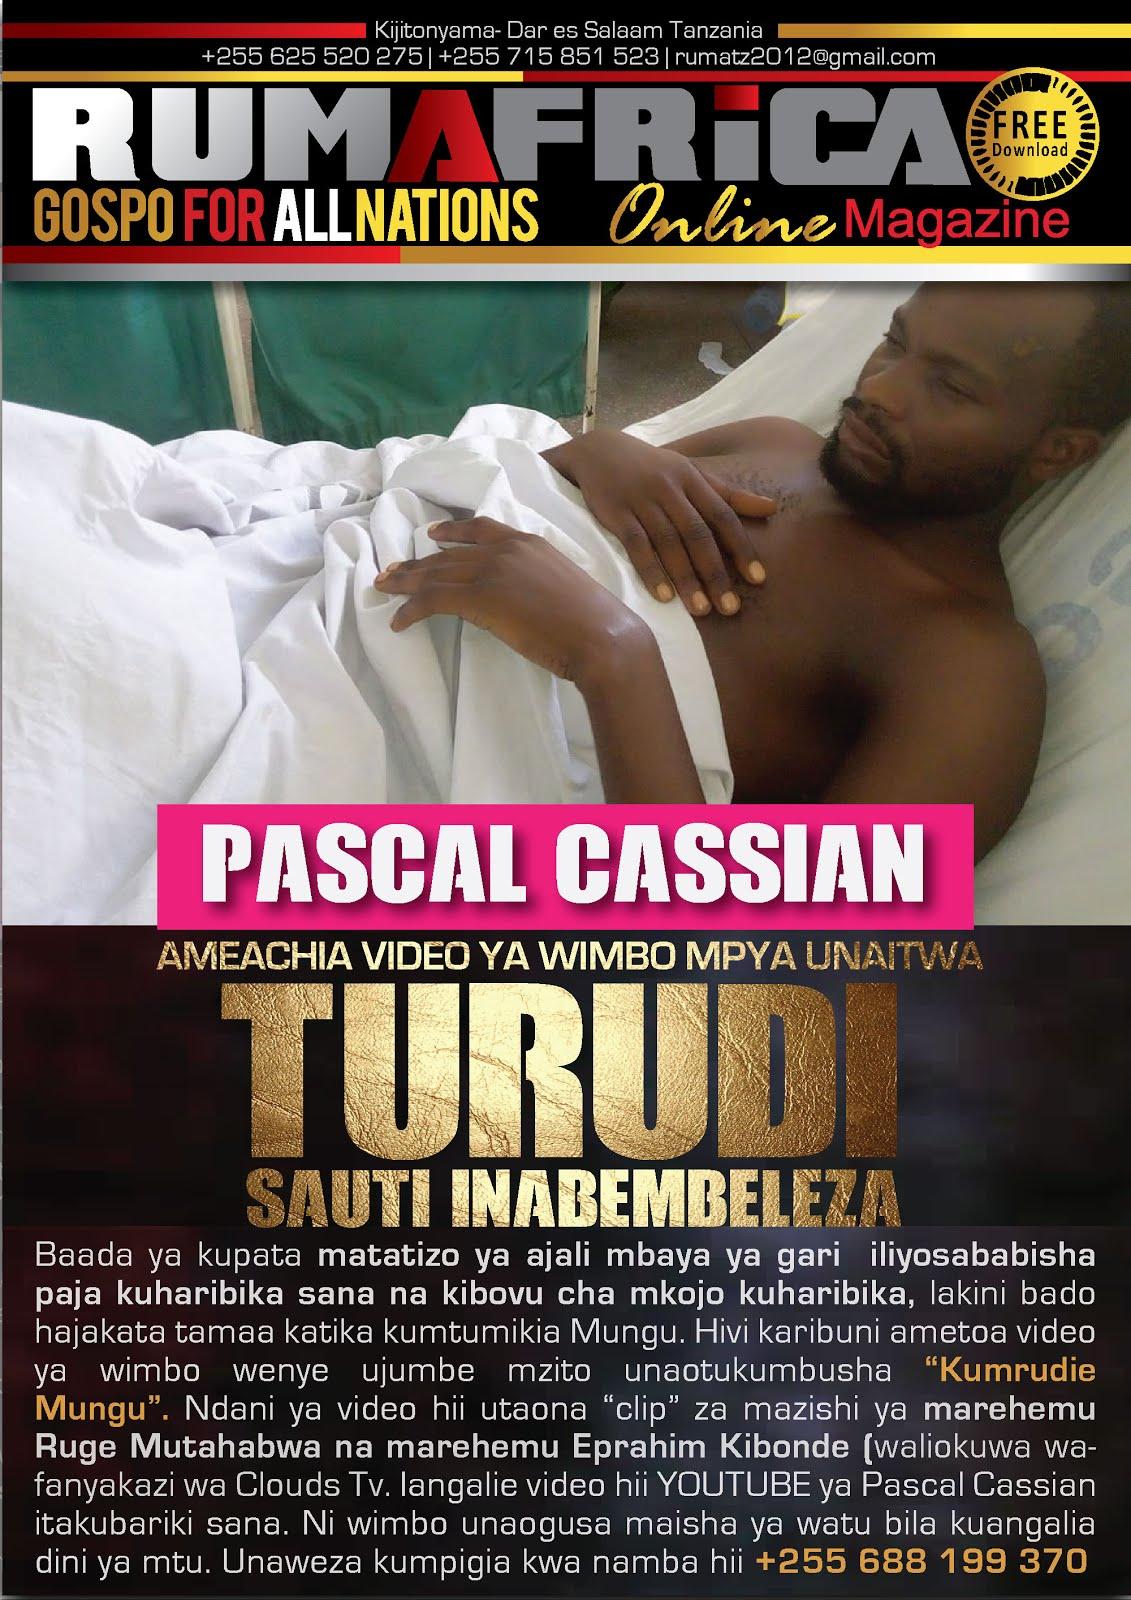 PASCAL CASSIAN